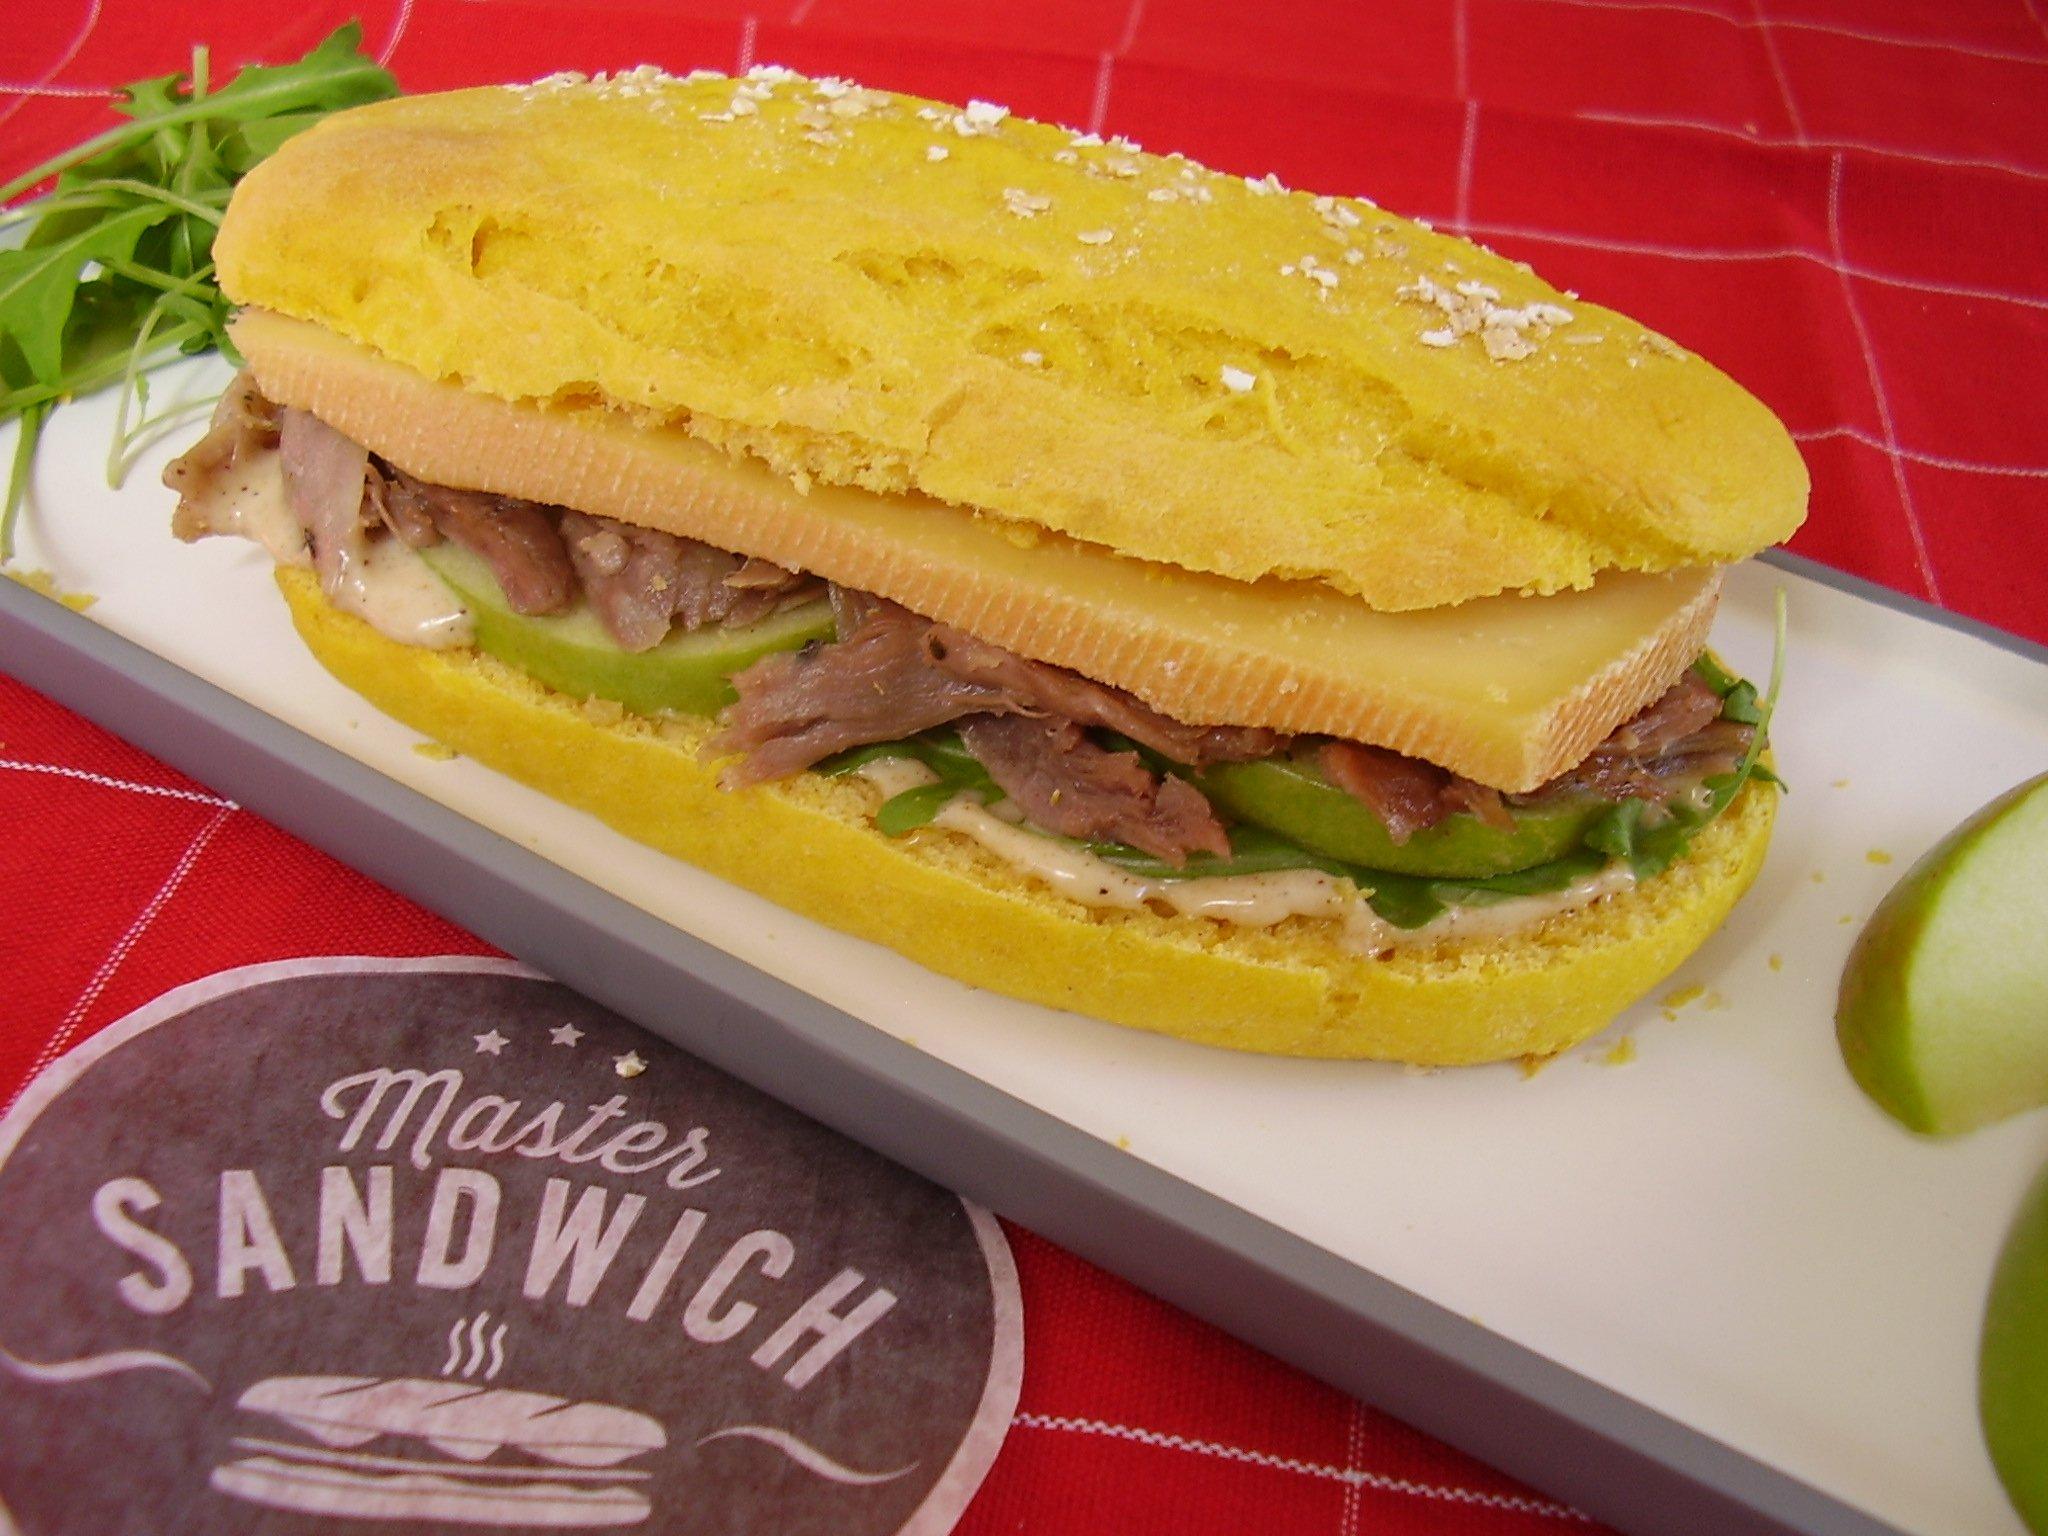 Master Sandwich : Le Toasté Audacieux